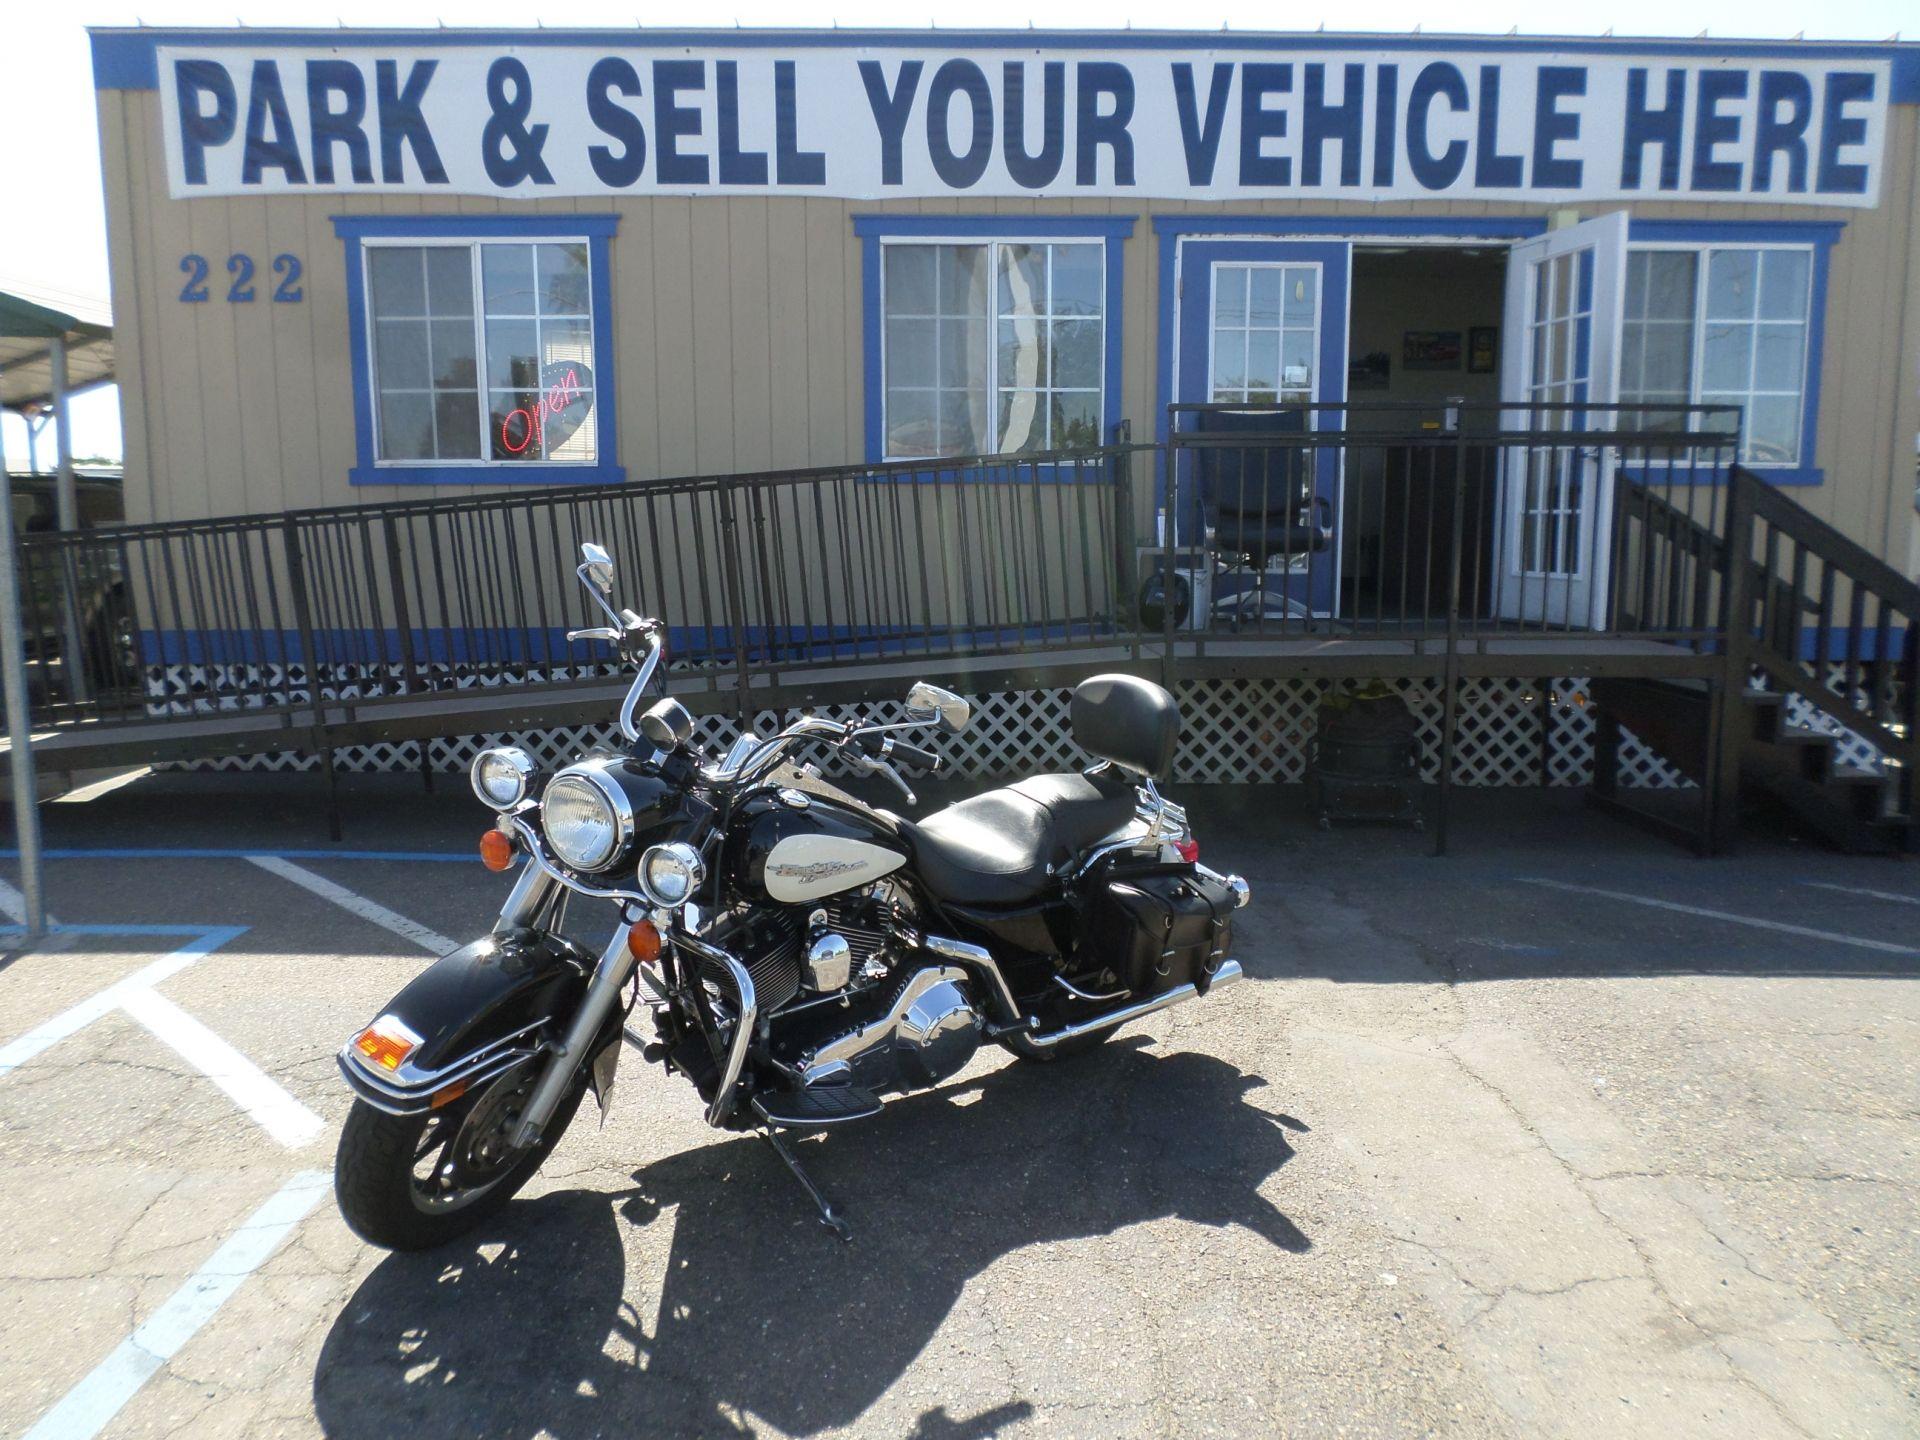 Motorcycle For Sale 2004 Harley Davidson Road King Police Edition In Lodi Stockton Ca Road King Harley Davidson Pictures Harley Davidson